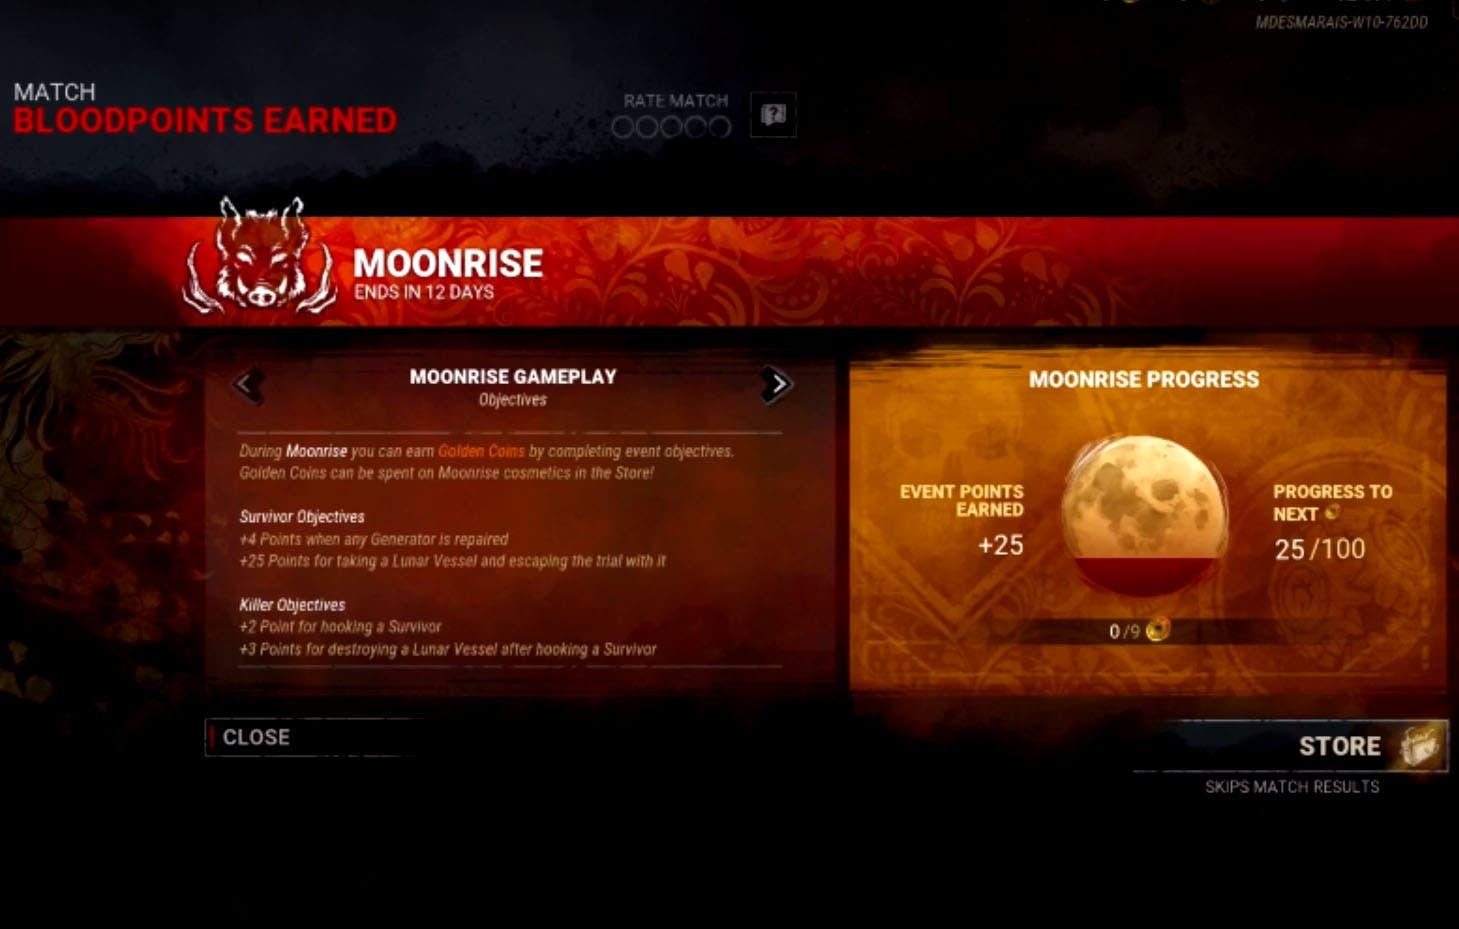 Dead by Daylight presenta su nuevo evento, The Moonrise